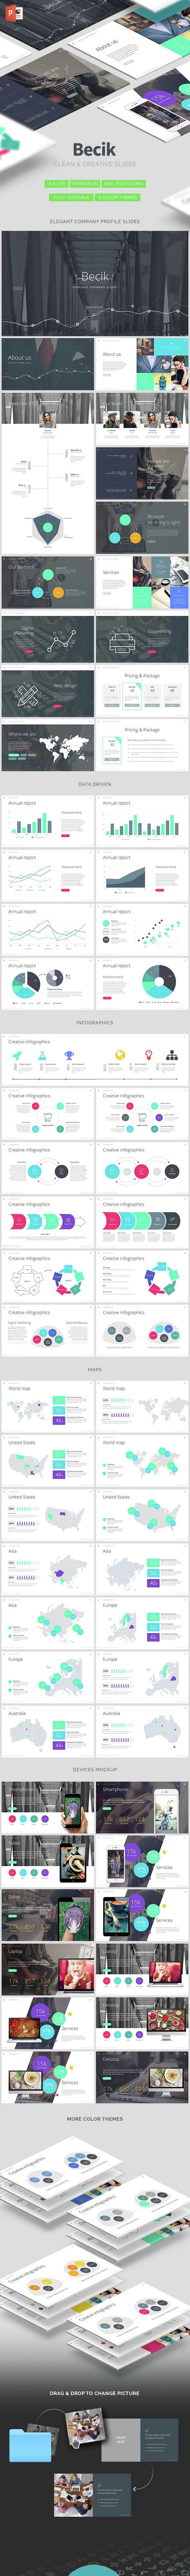 Becik - Creative Powerpoint Template - PowerPoint Templates Presentation Templates